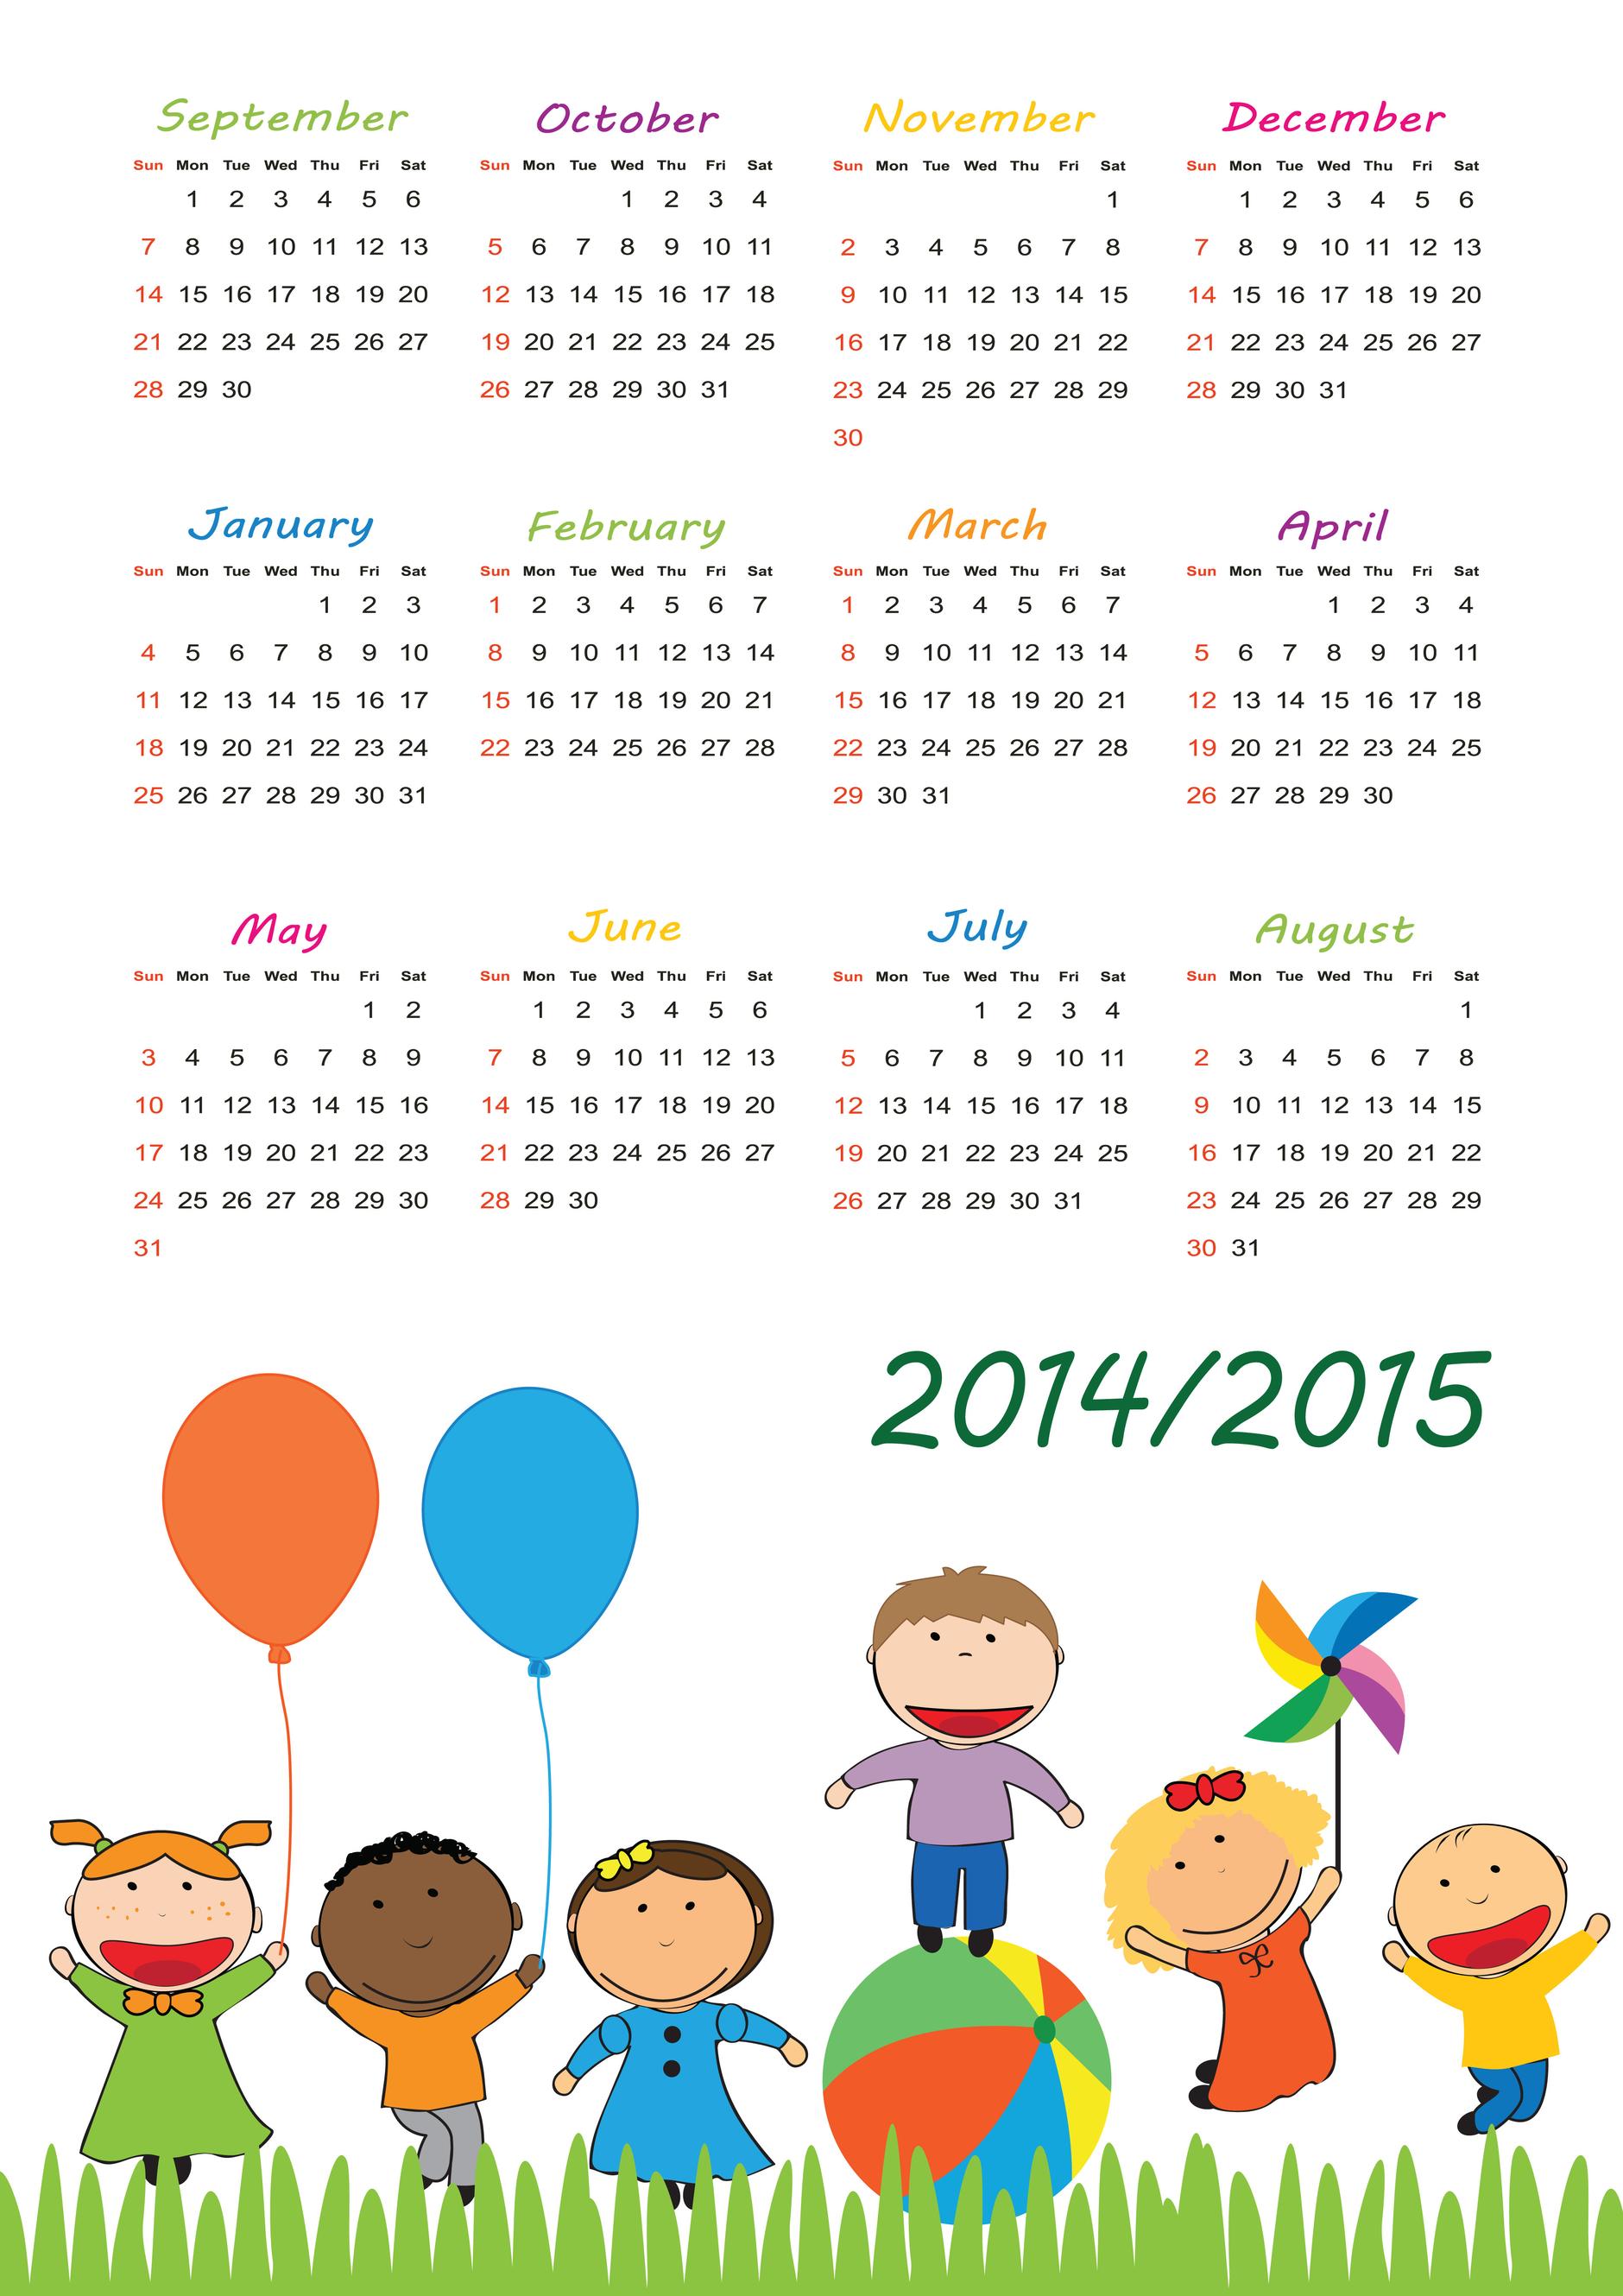 Clipart calendar august 2015 picture library library 2014 – 2015 Calendar – September to August - KidsPressMagazine.com picture library library